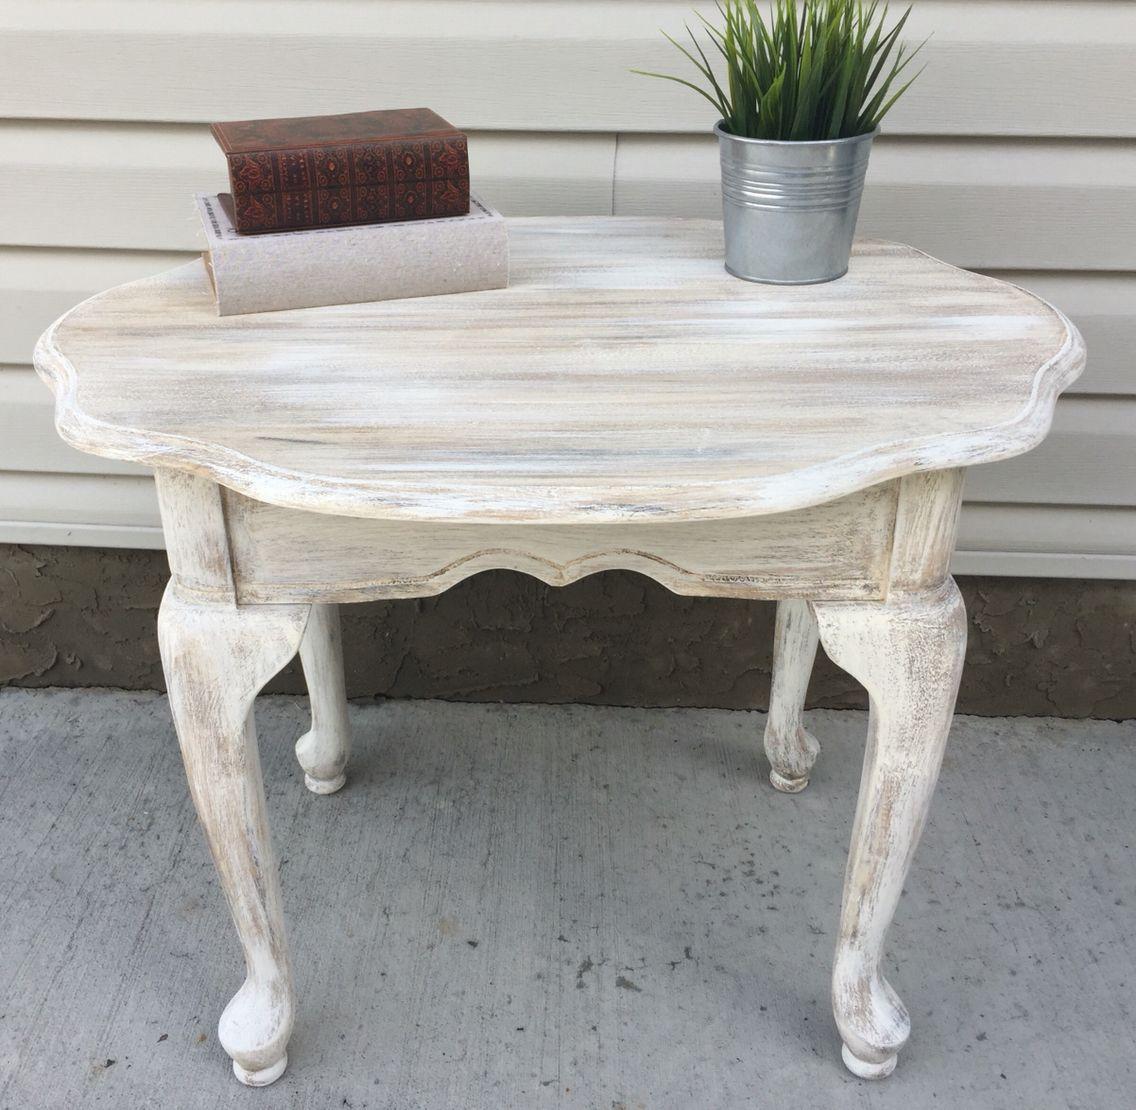 покраска стола в белый цвет